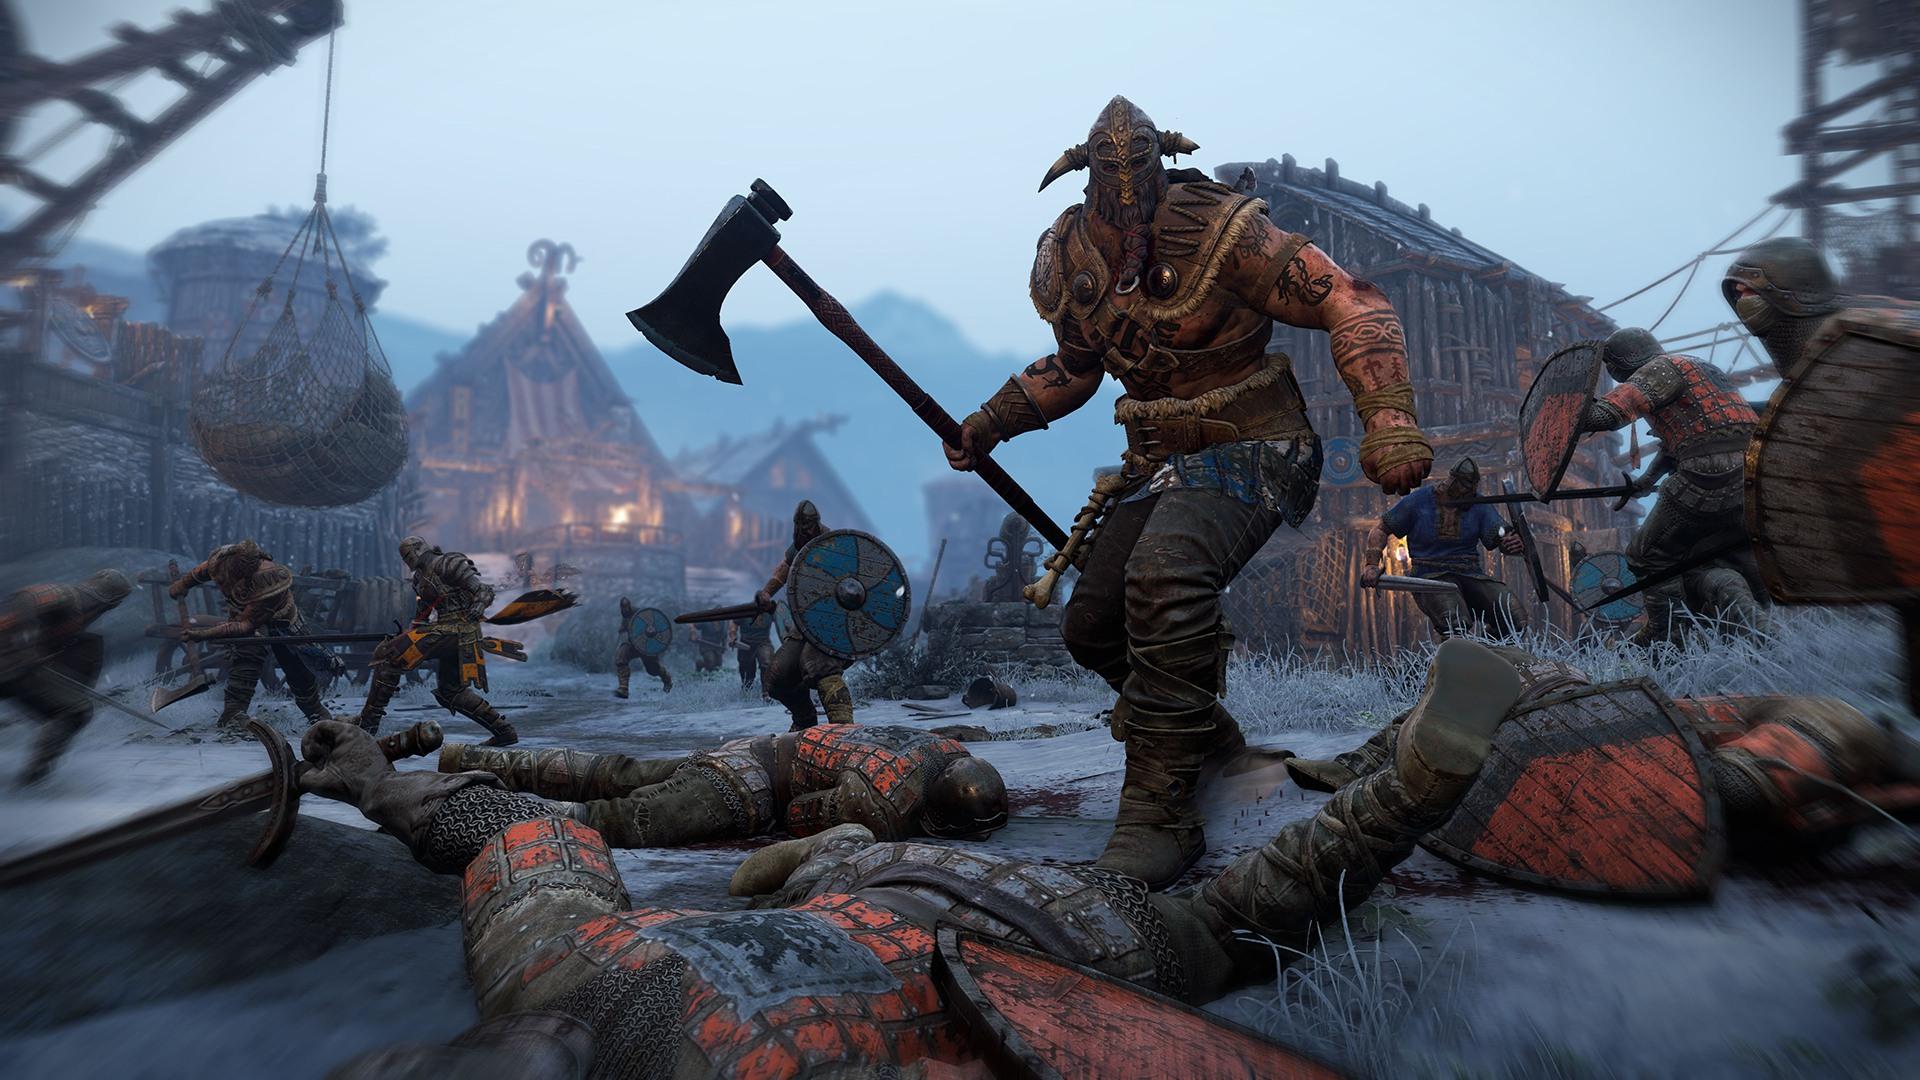 Vikings games